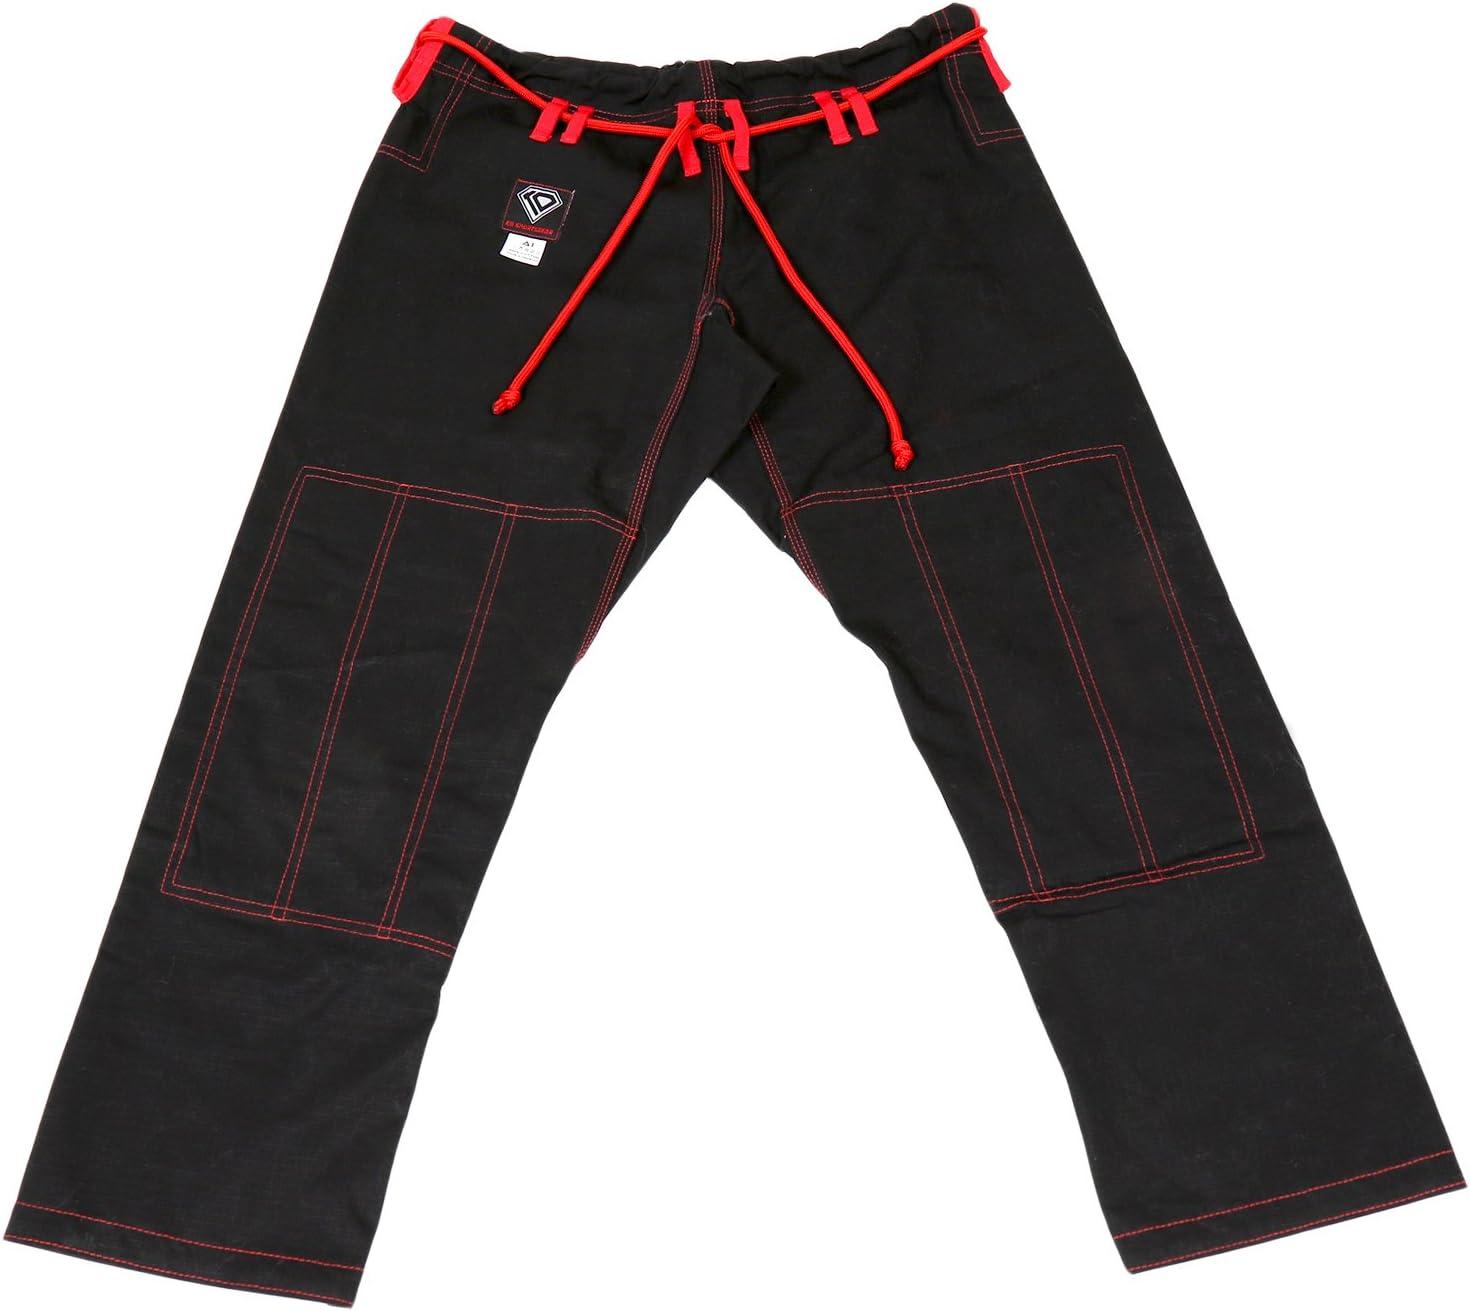 KO Cash special price Sports Gear Black Gi Pants 100% Cotton Ultra-Cheap Deals Stop – Preshrunk Rip R